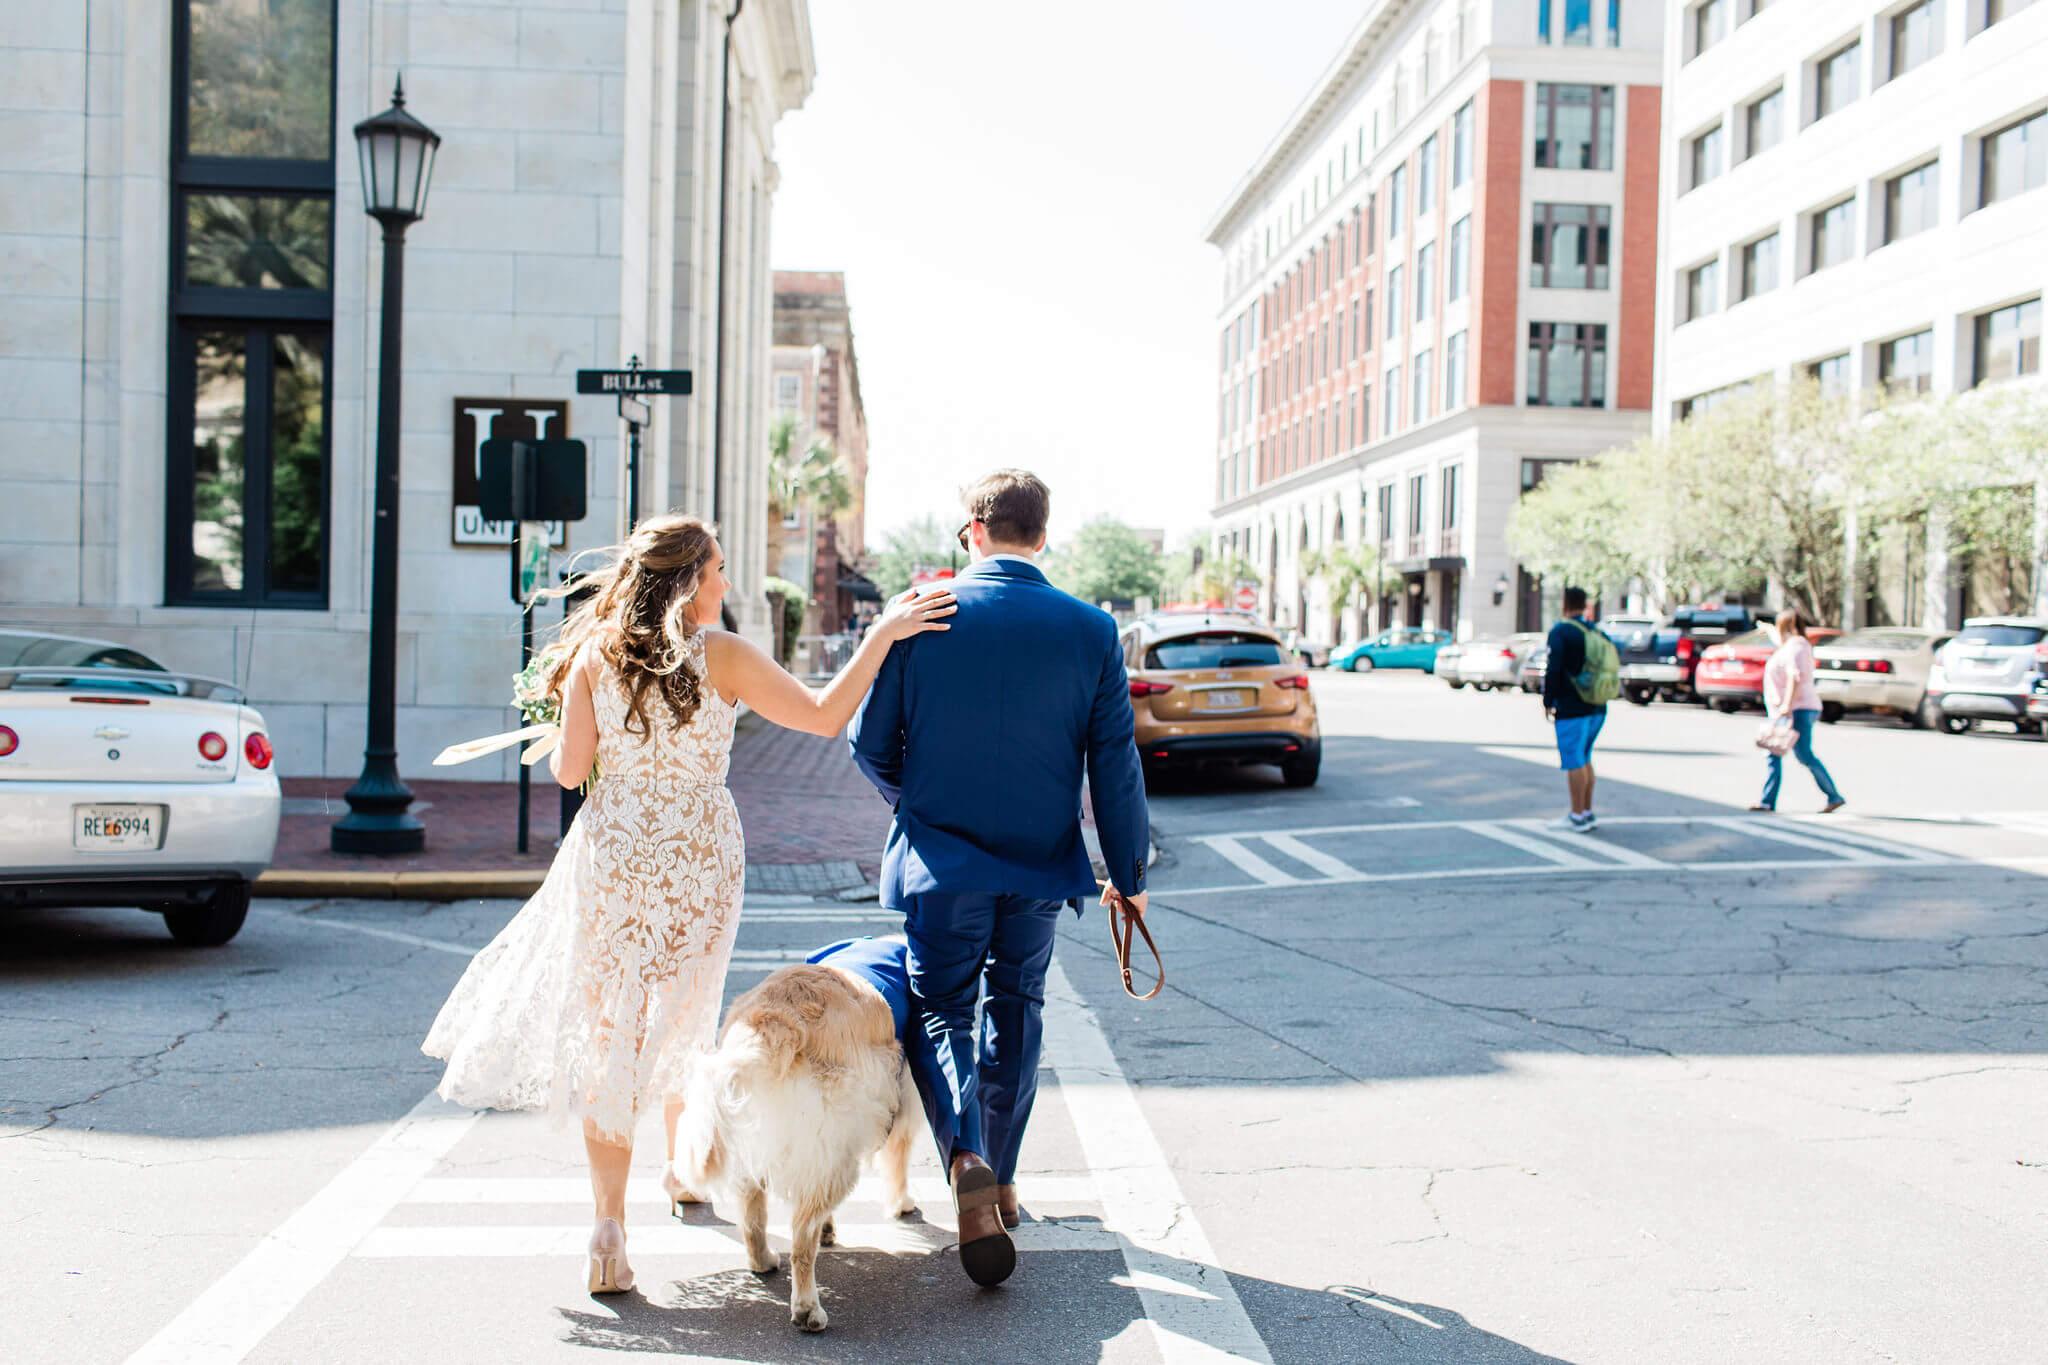 apt-b-photography-savannah-wedding-photographer-savannah-wedding-savannah-elopement-intimate-wedding-photographer-60.JPG